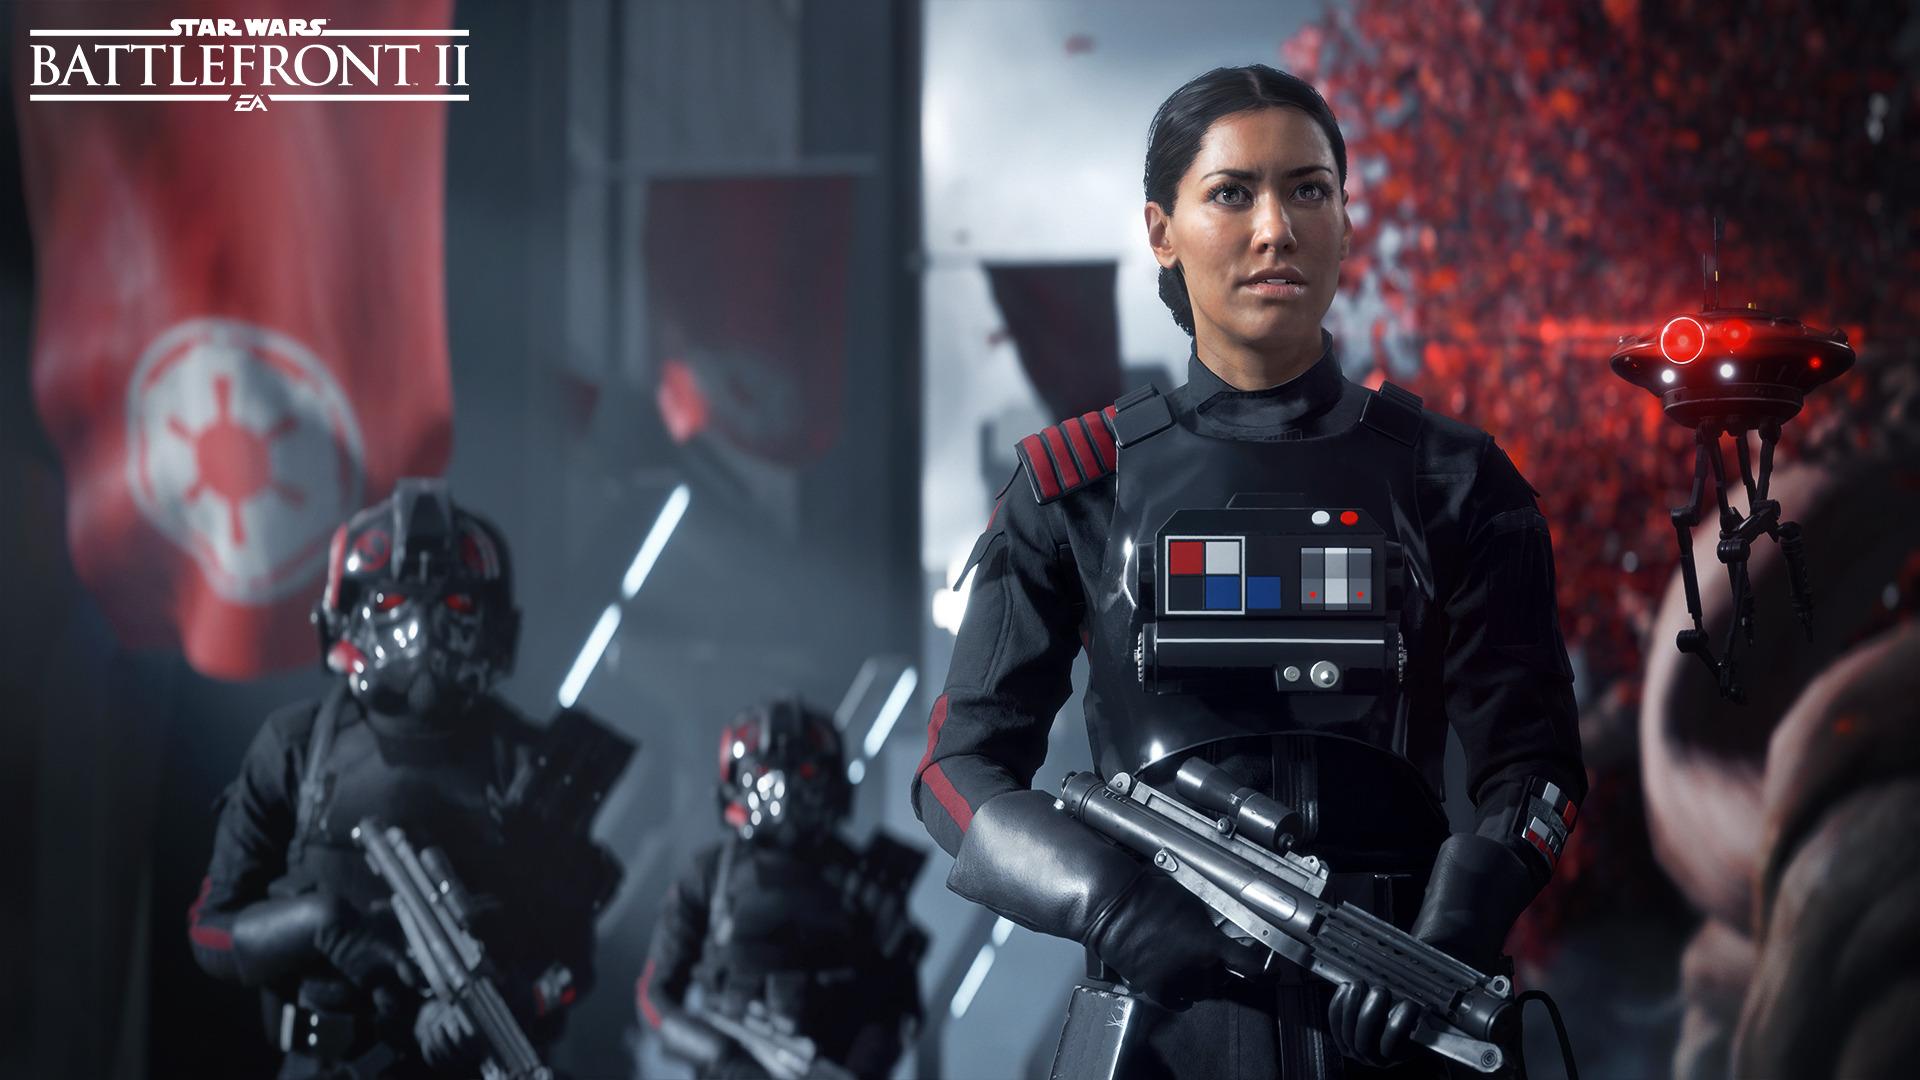 Novos vídeos mostram a campanha de Star Wars Battlefront II